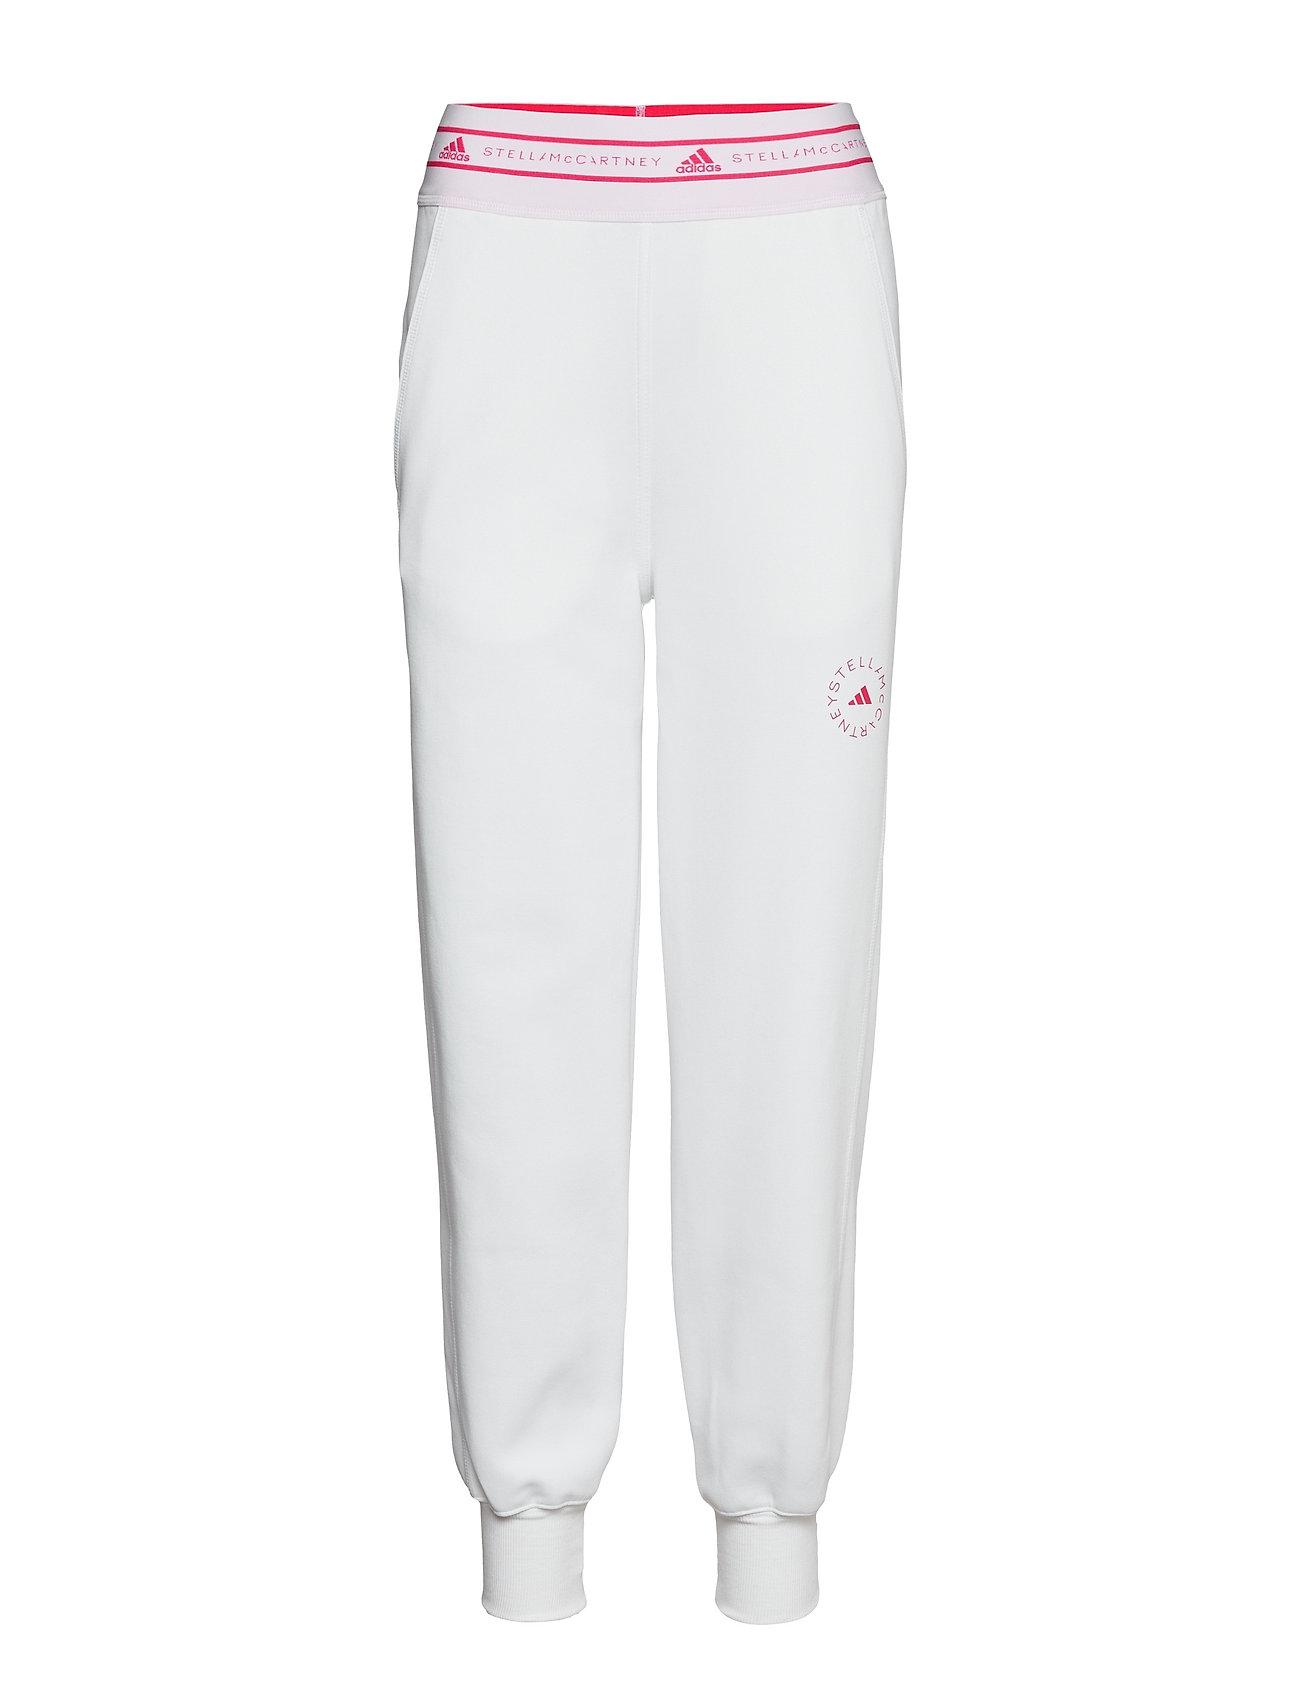 Sc Sweat Pants W Sweatpants Hyggebukser Hvid Adidas By Stella McCartney